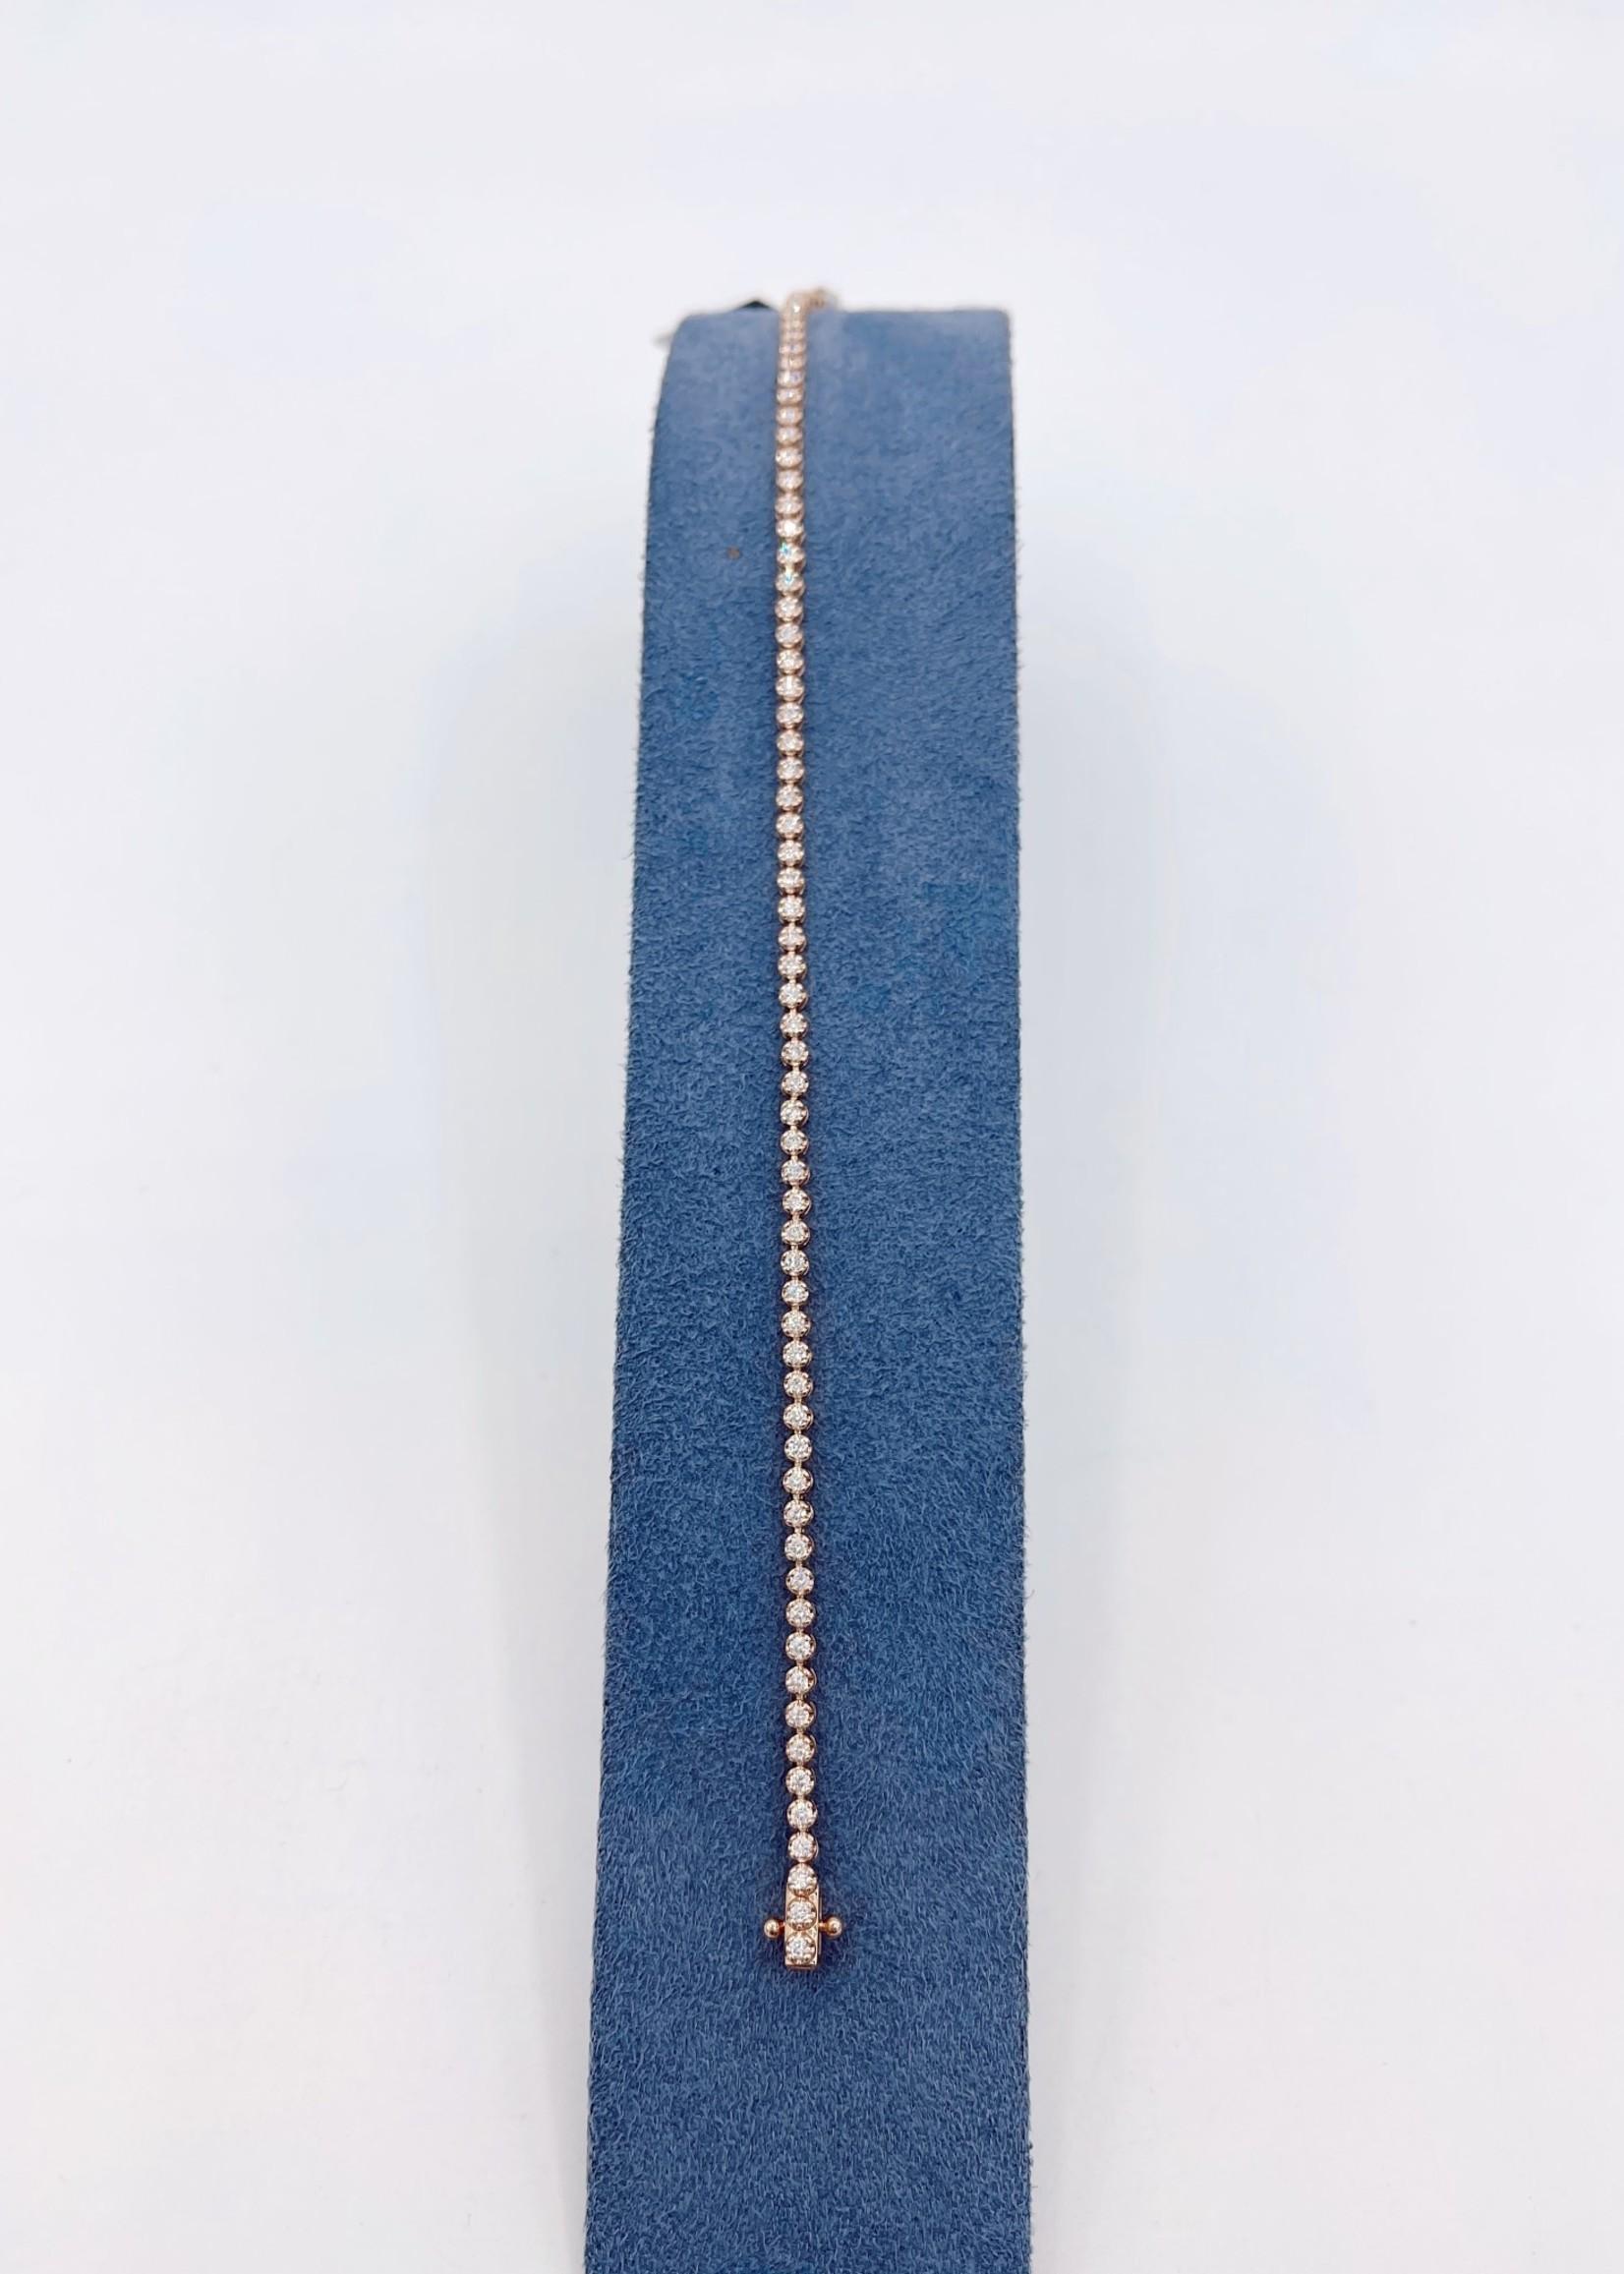 DSL Pearl Rose Gold Diamond Tennis Bracelet 1.05ct